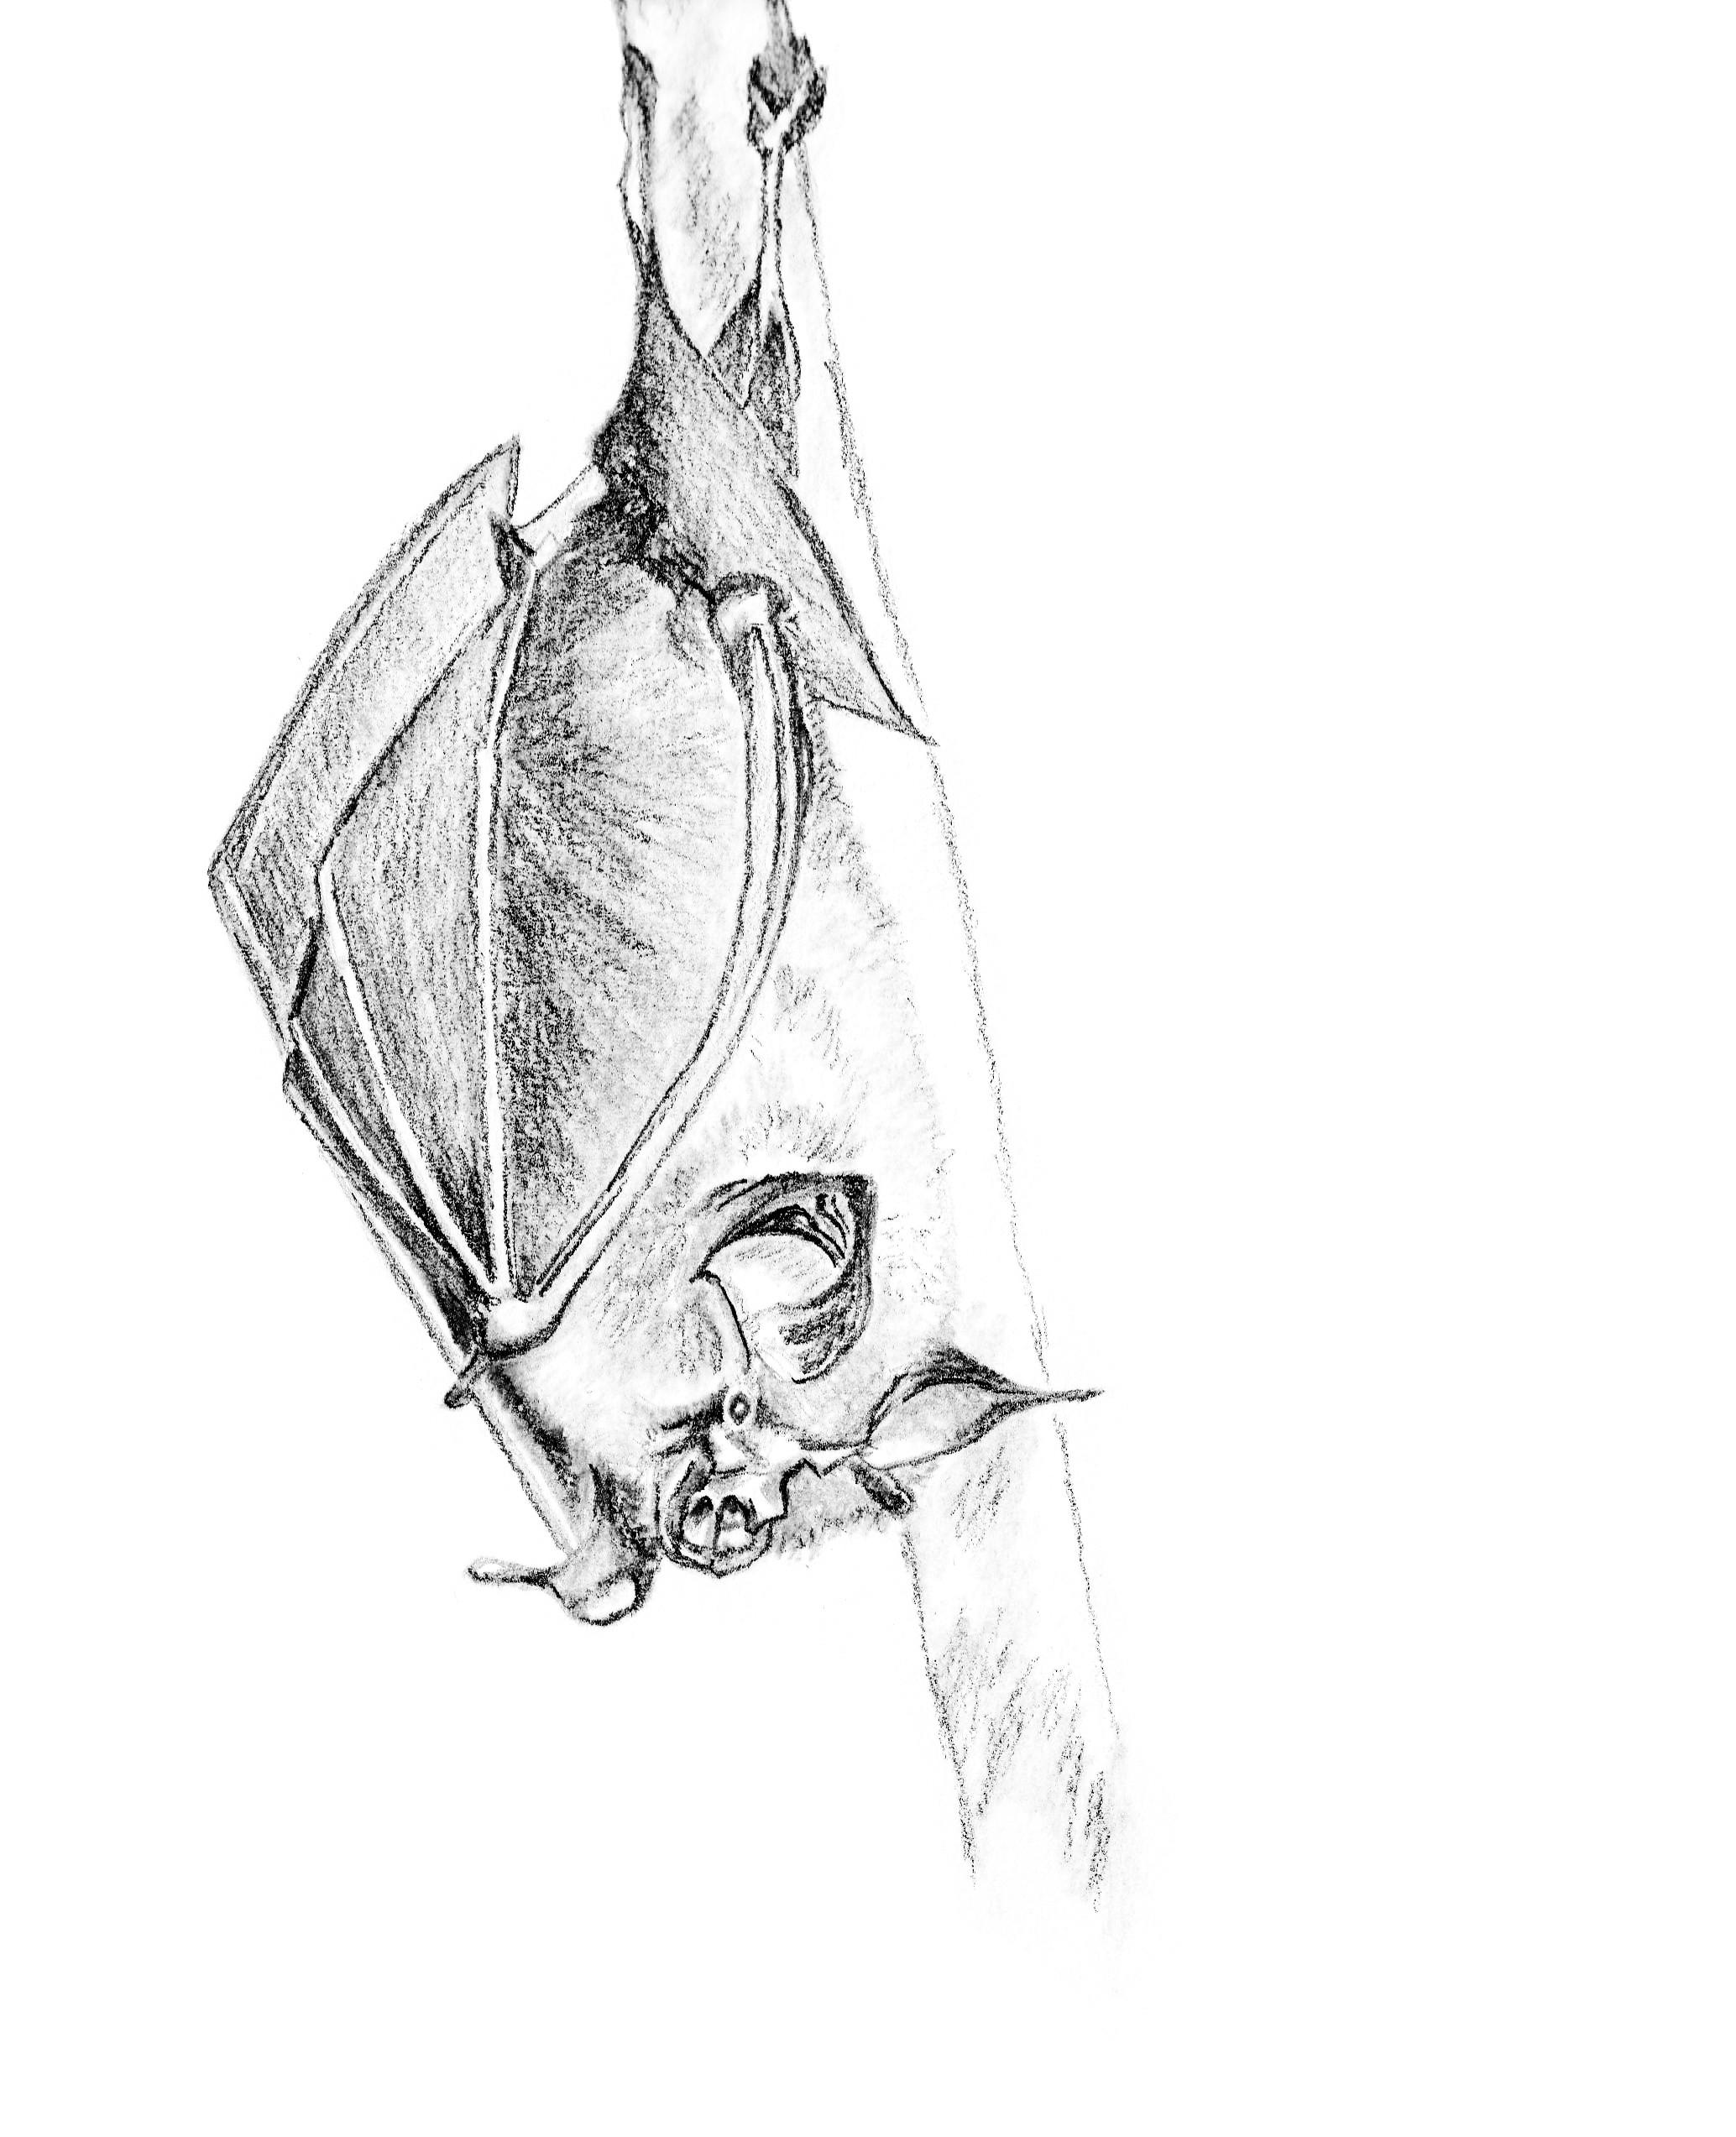 Petit Rhinolophe © Grand'Air Illustration